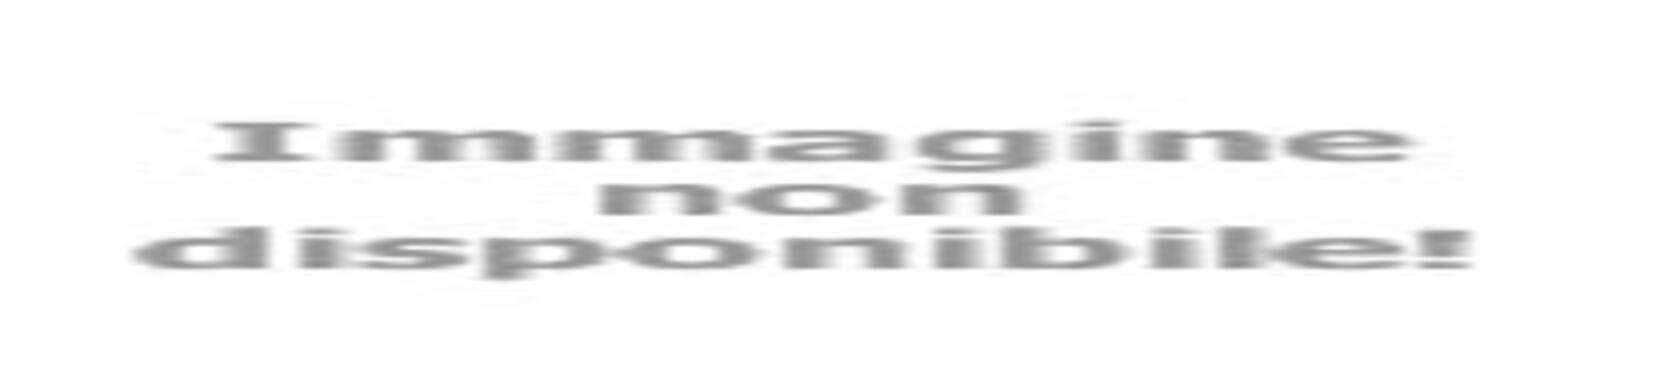 basketriminicrabs it 6-2726-video-eybl-u20-playoff-intervista-coach-firic-e-urukalo 005